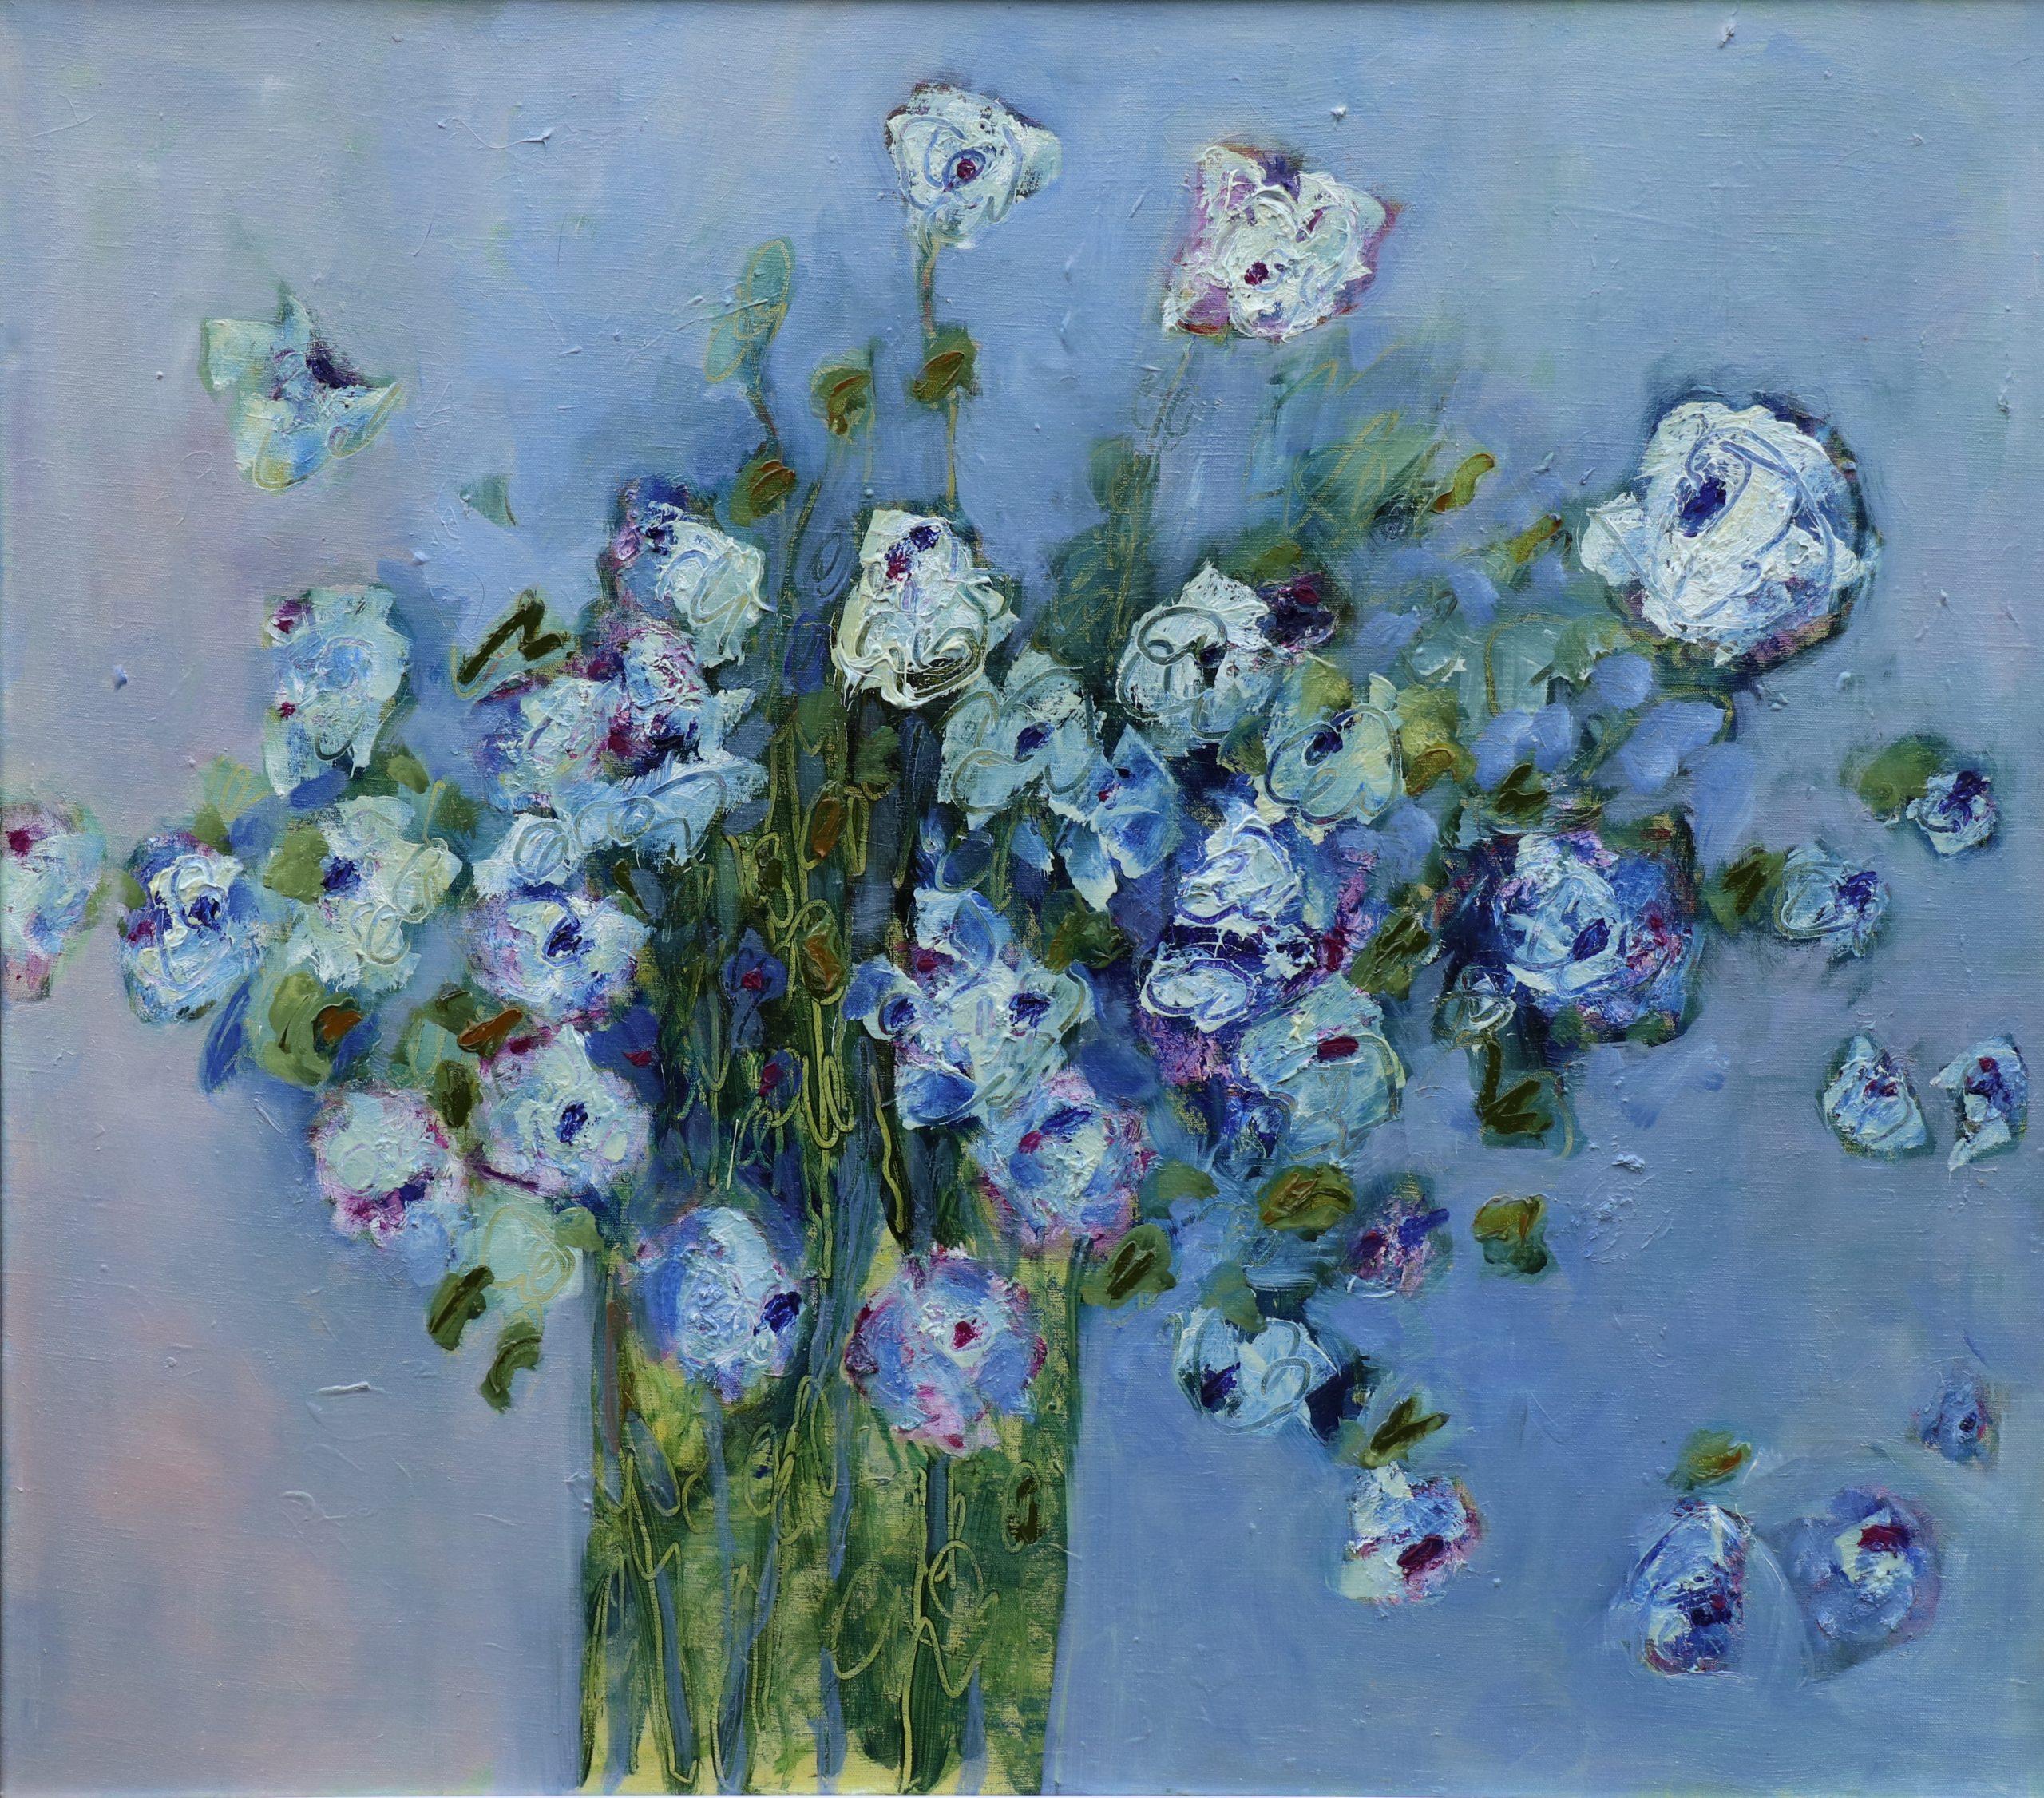 Blauwe Bloemen